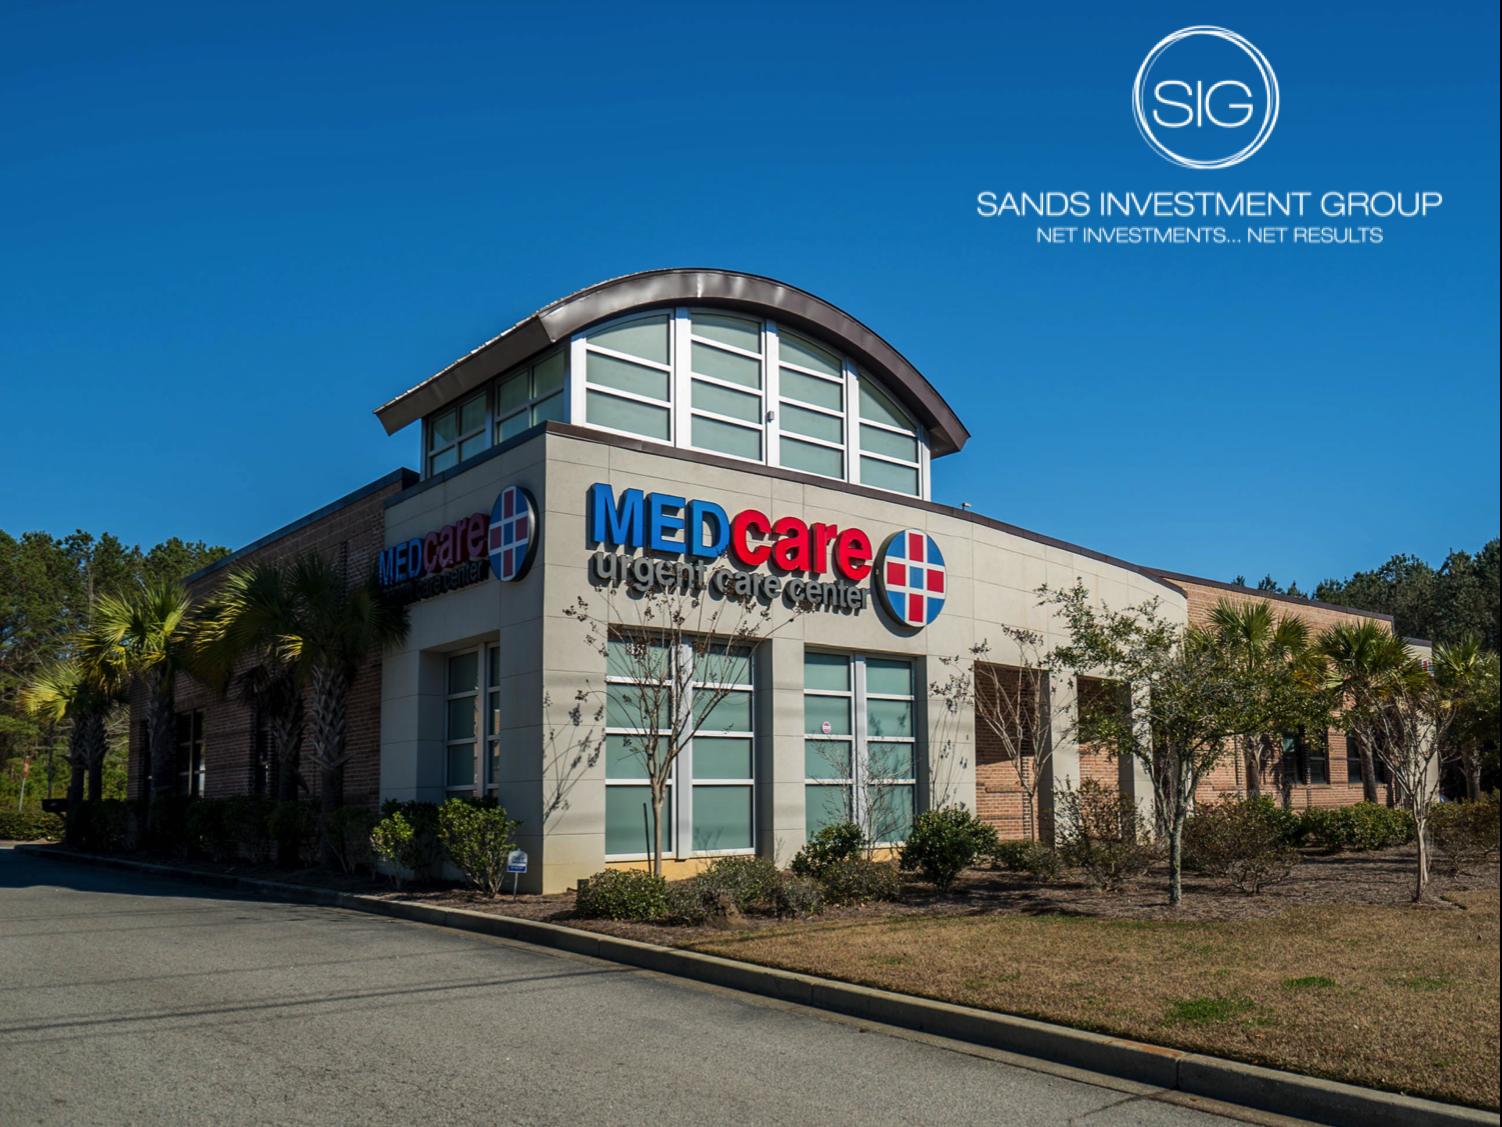 MEDCare Urgent Care